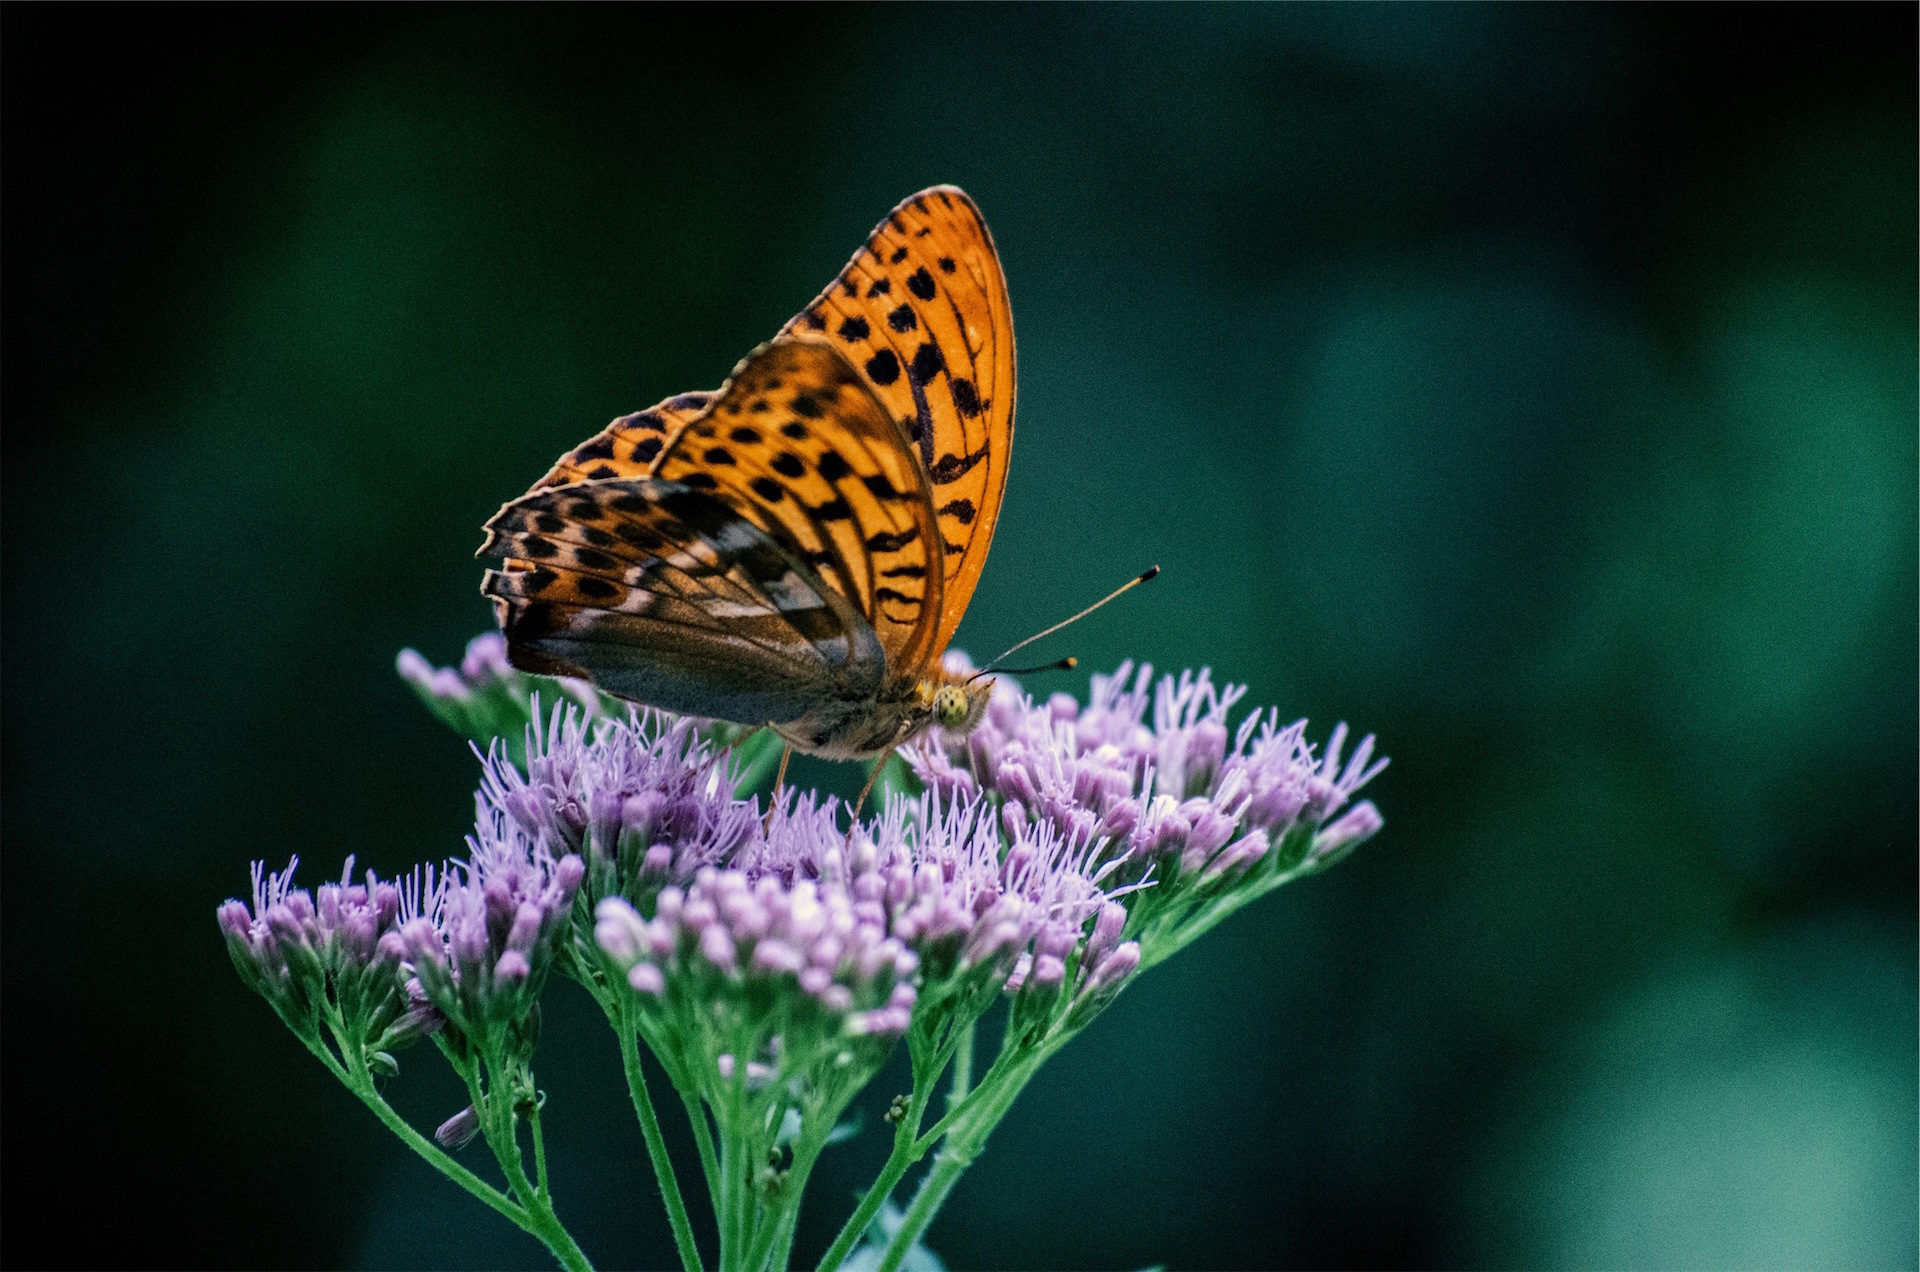 mariposa, flores, alas, belleza, insecto - Fondos de Pantalla HD - professor-falken.com